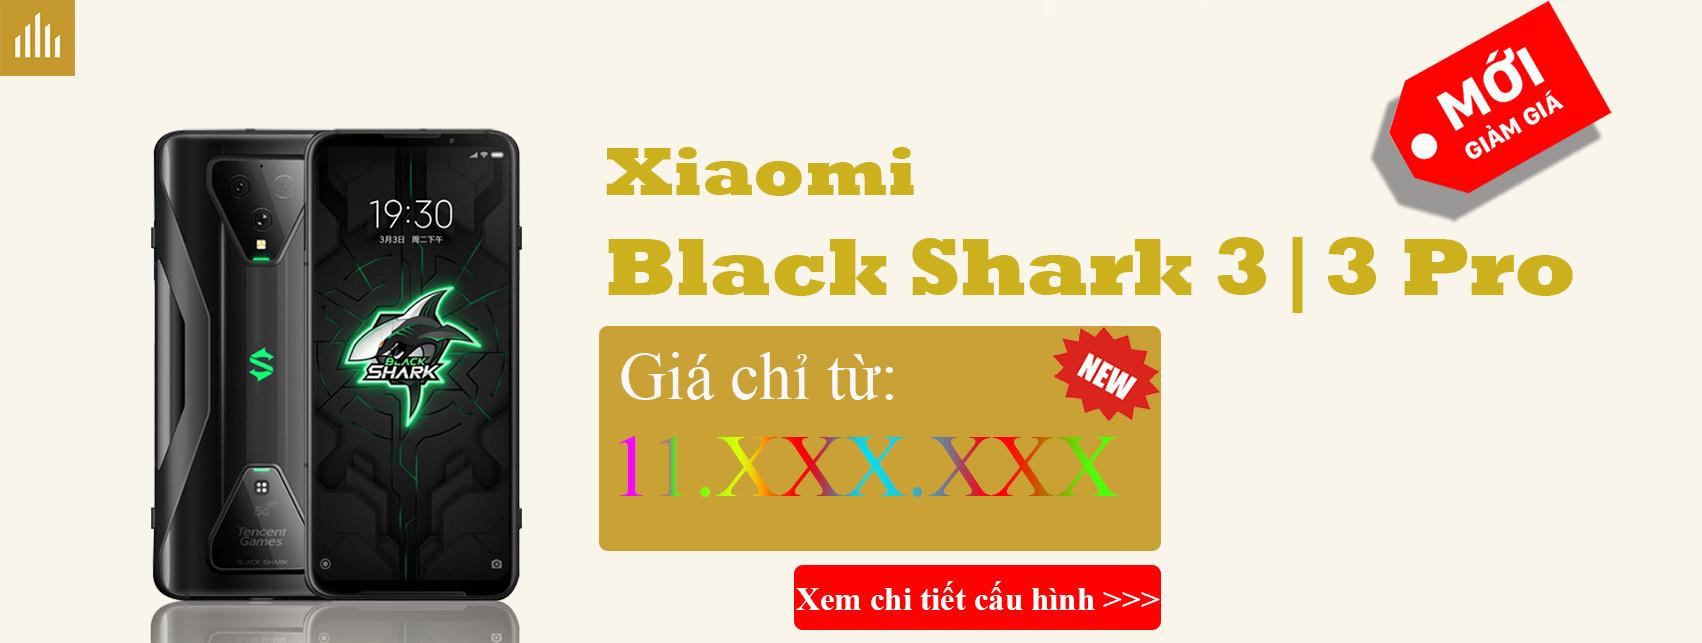 Xiaomi Black Shark 3 Pro Mobilecity